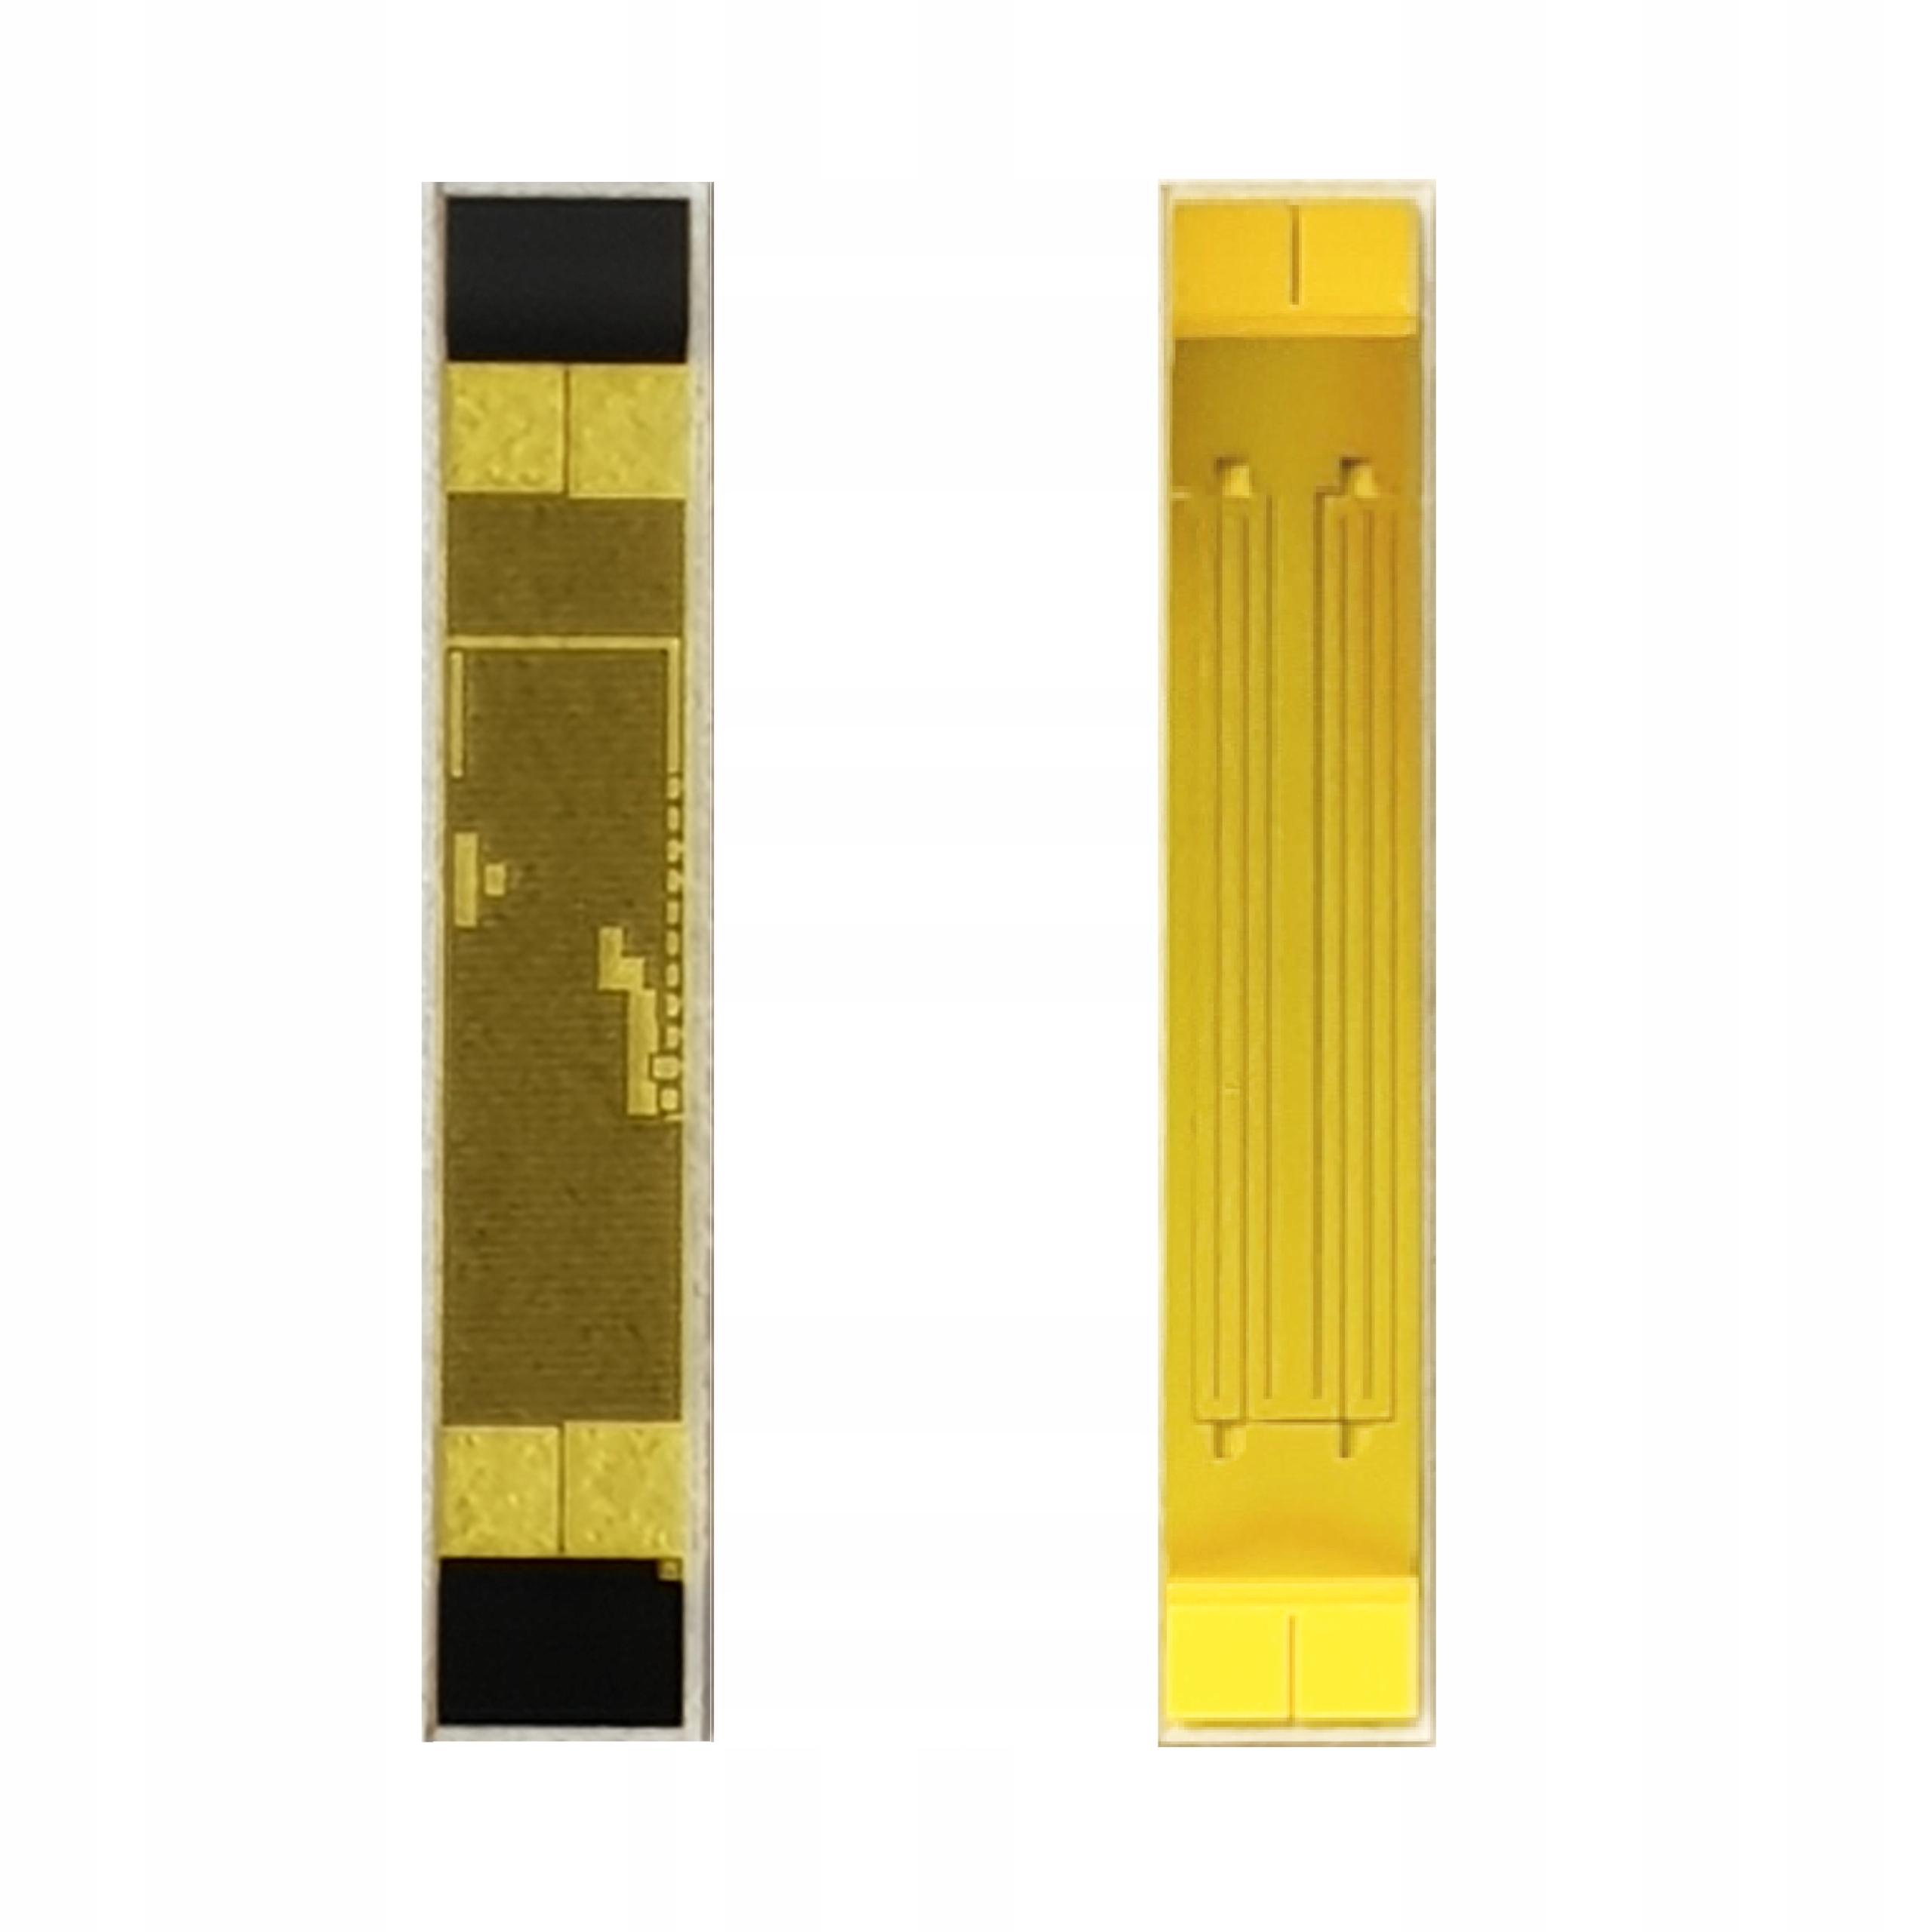 листочки расходомер mercedes w168 a-klasa f-vat